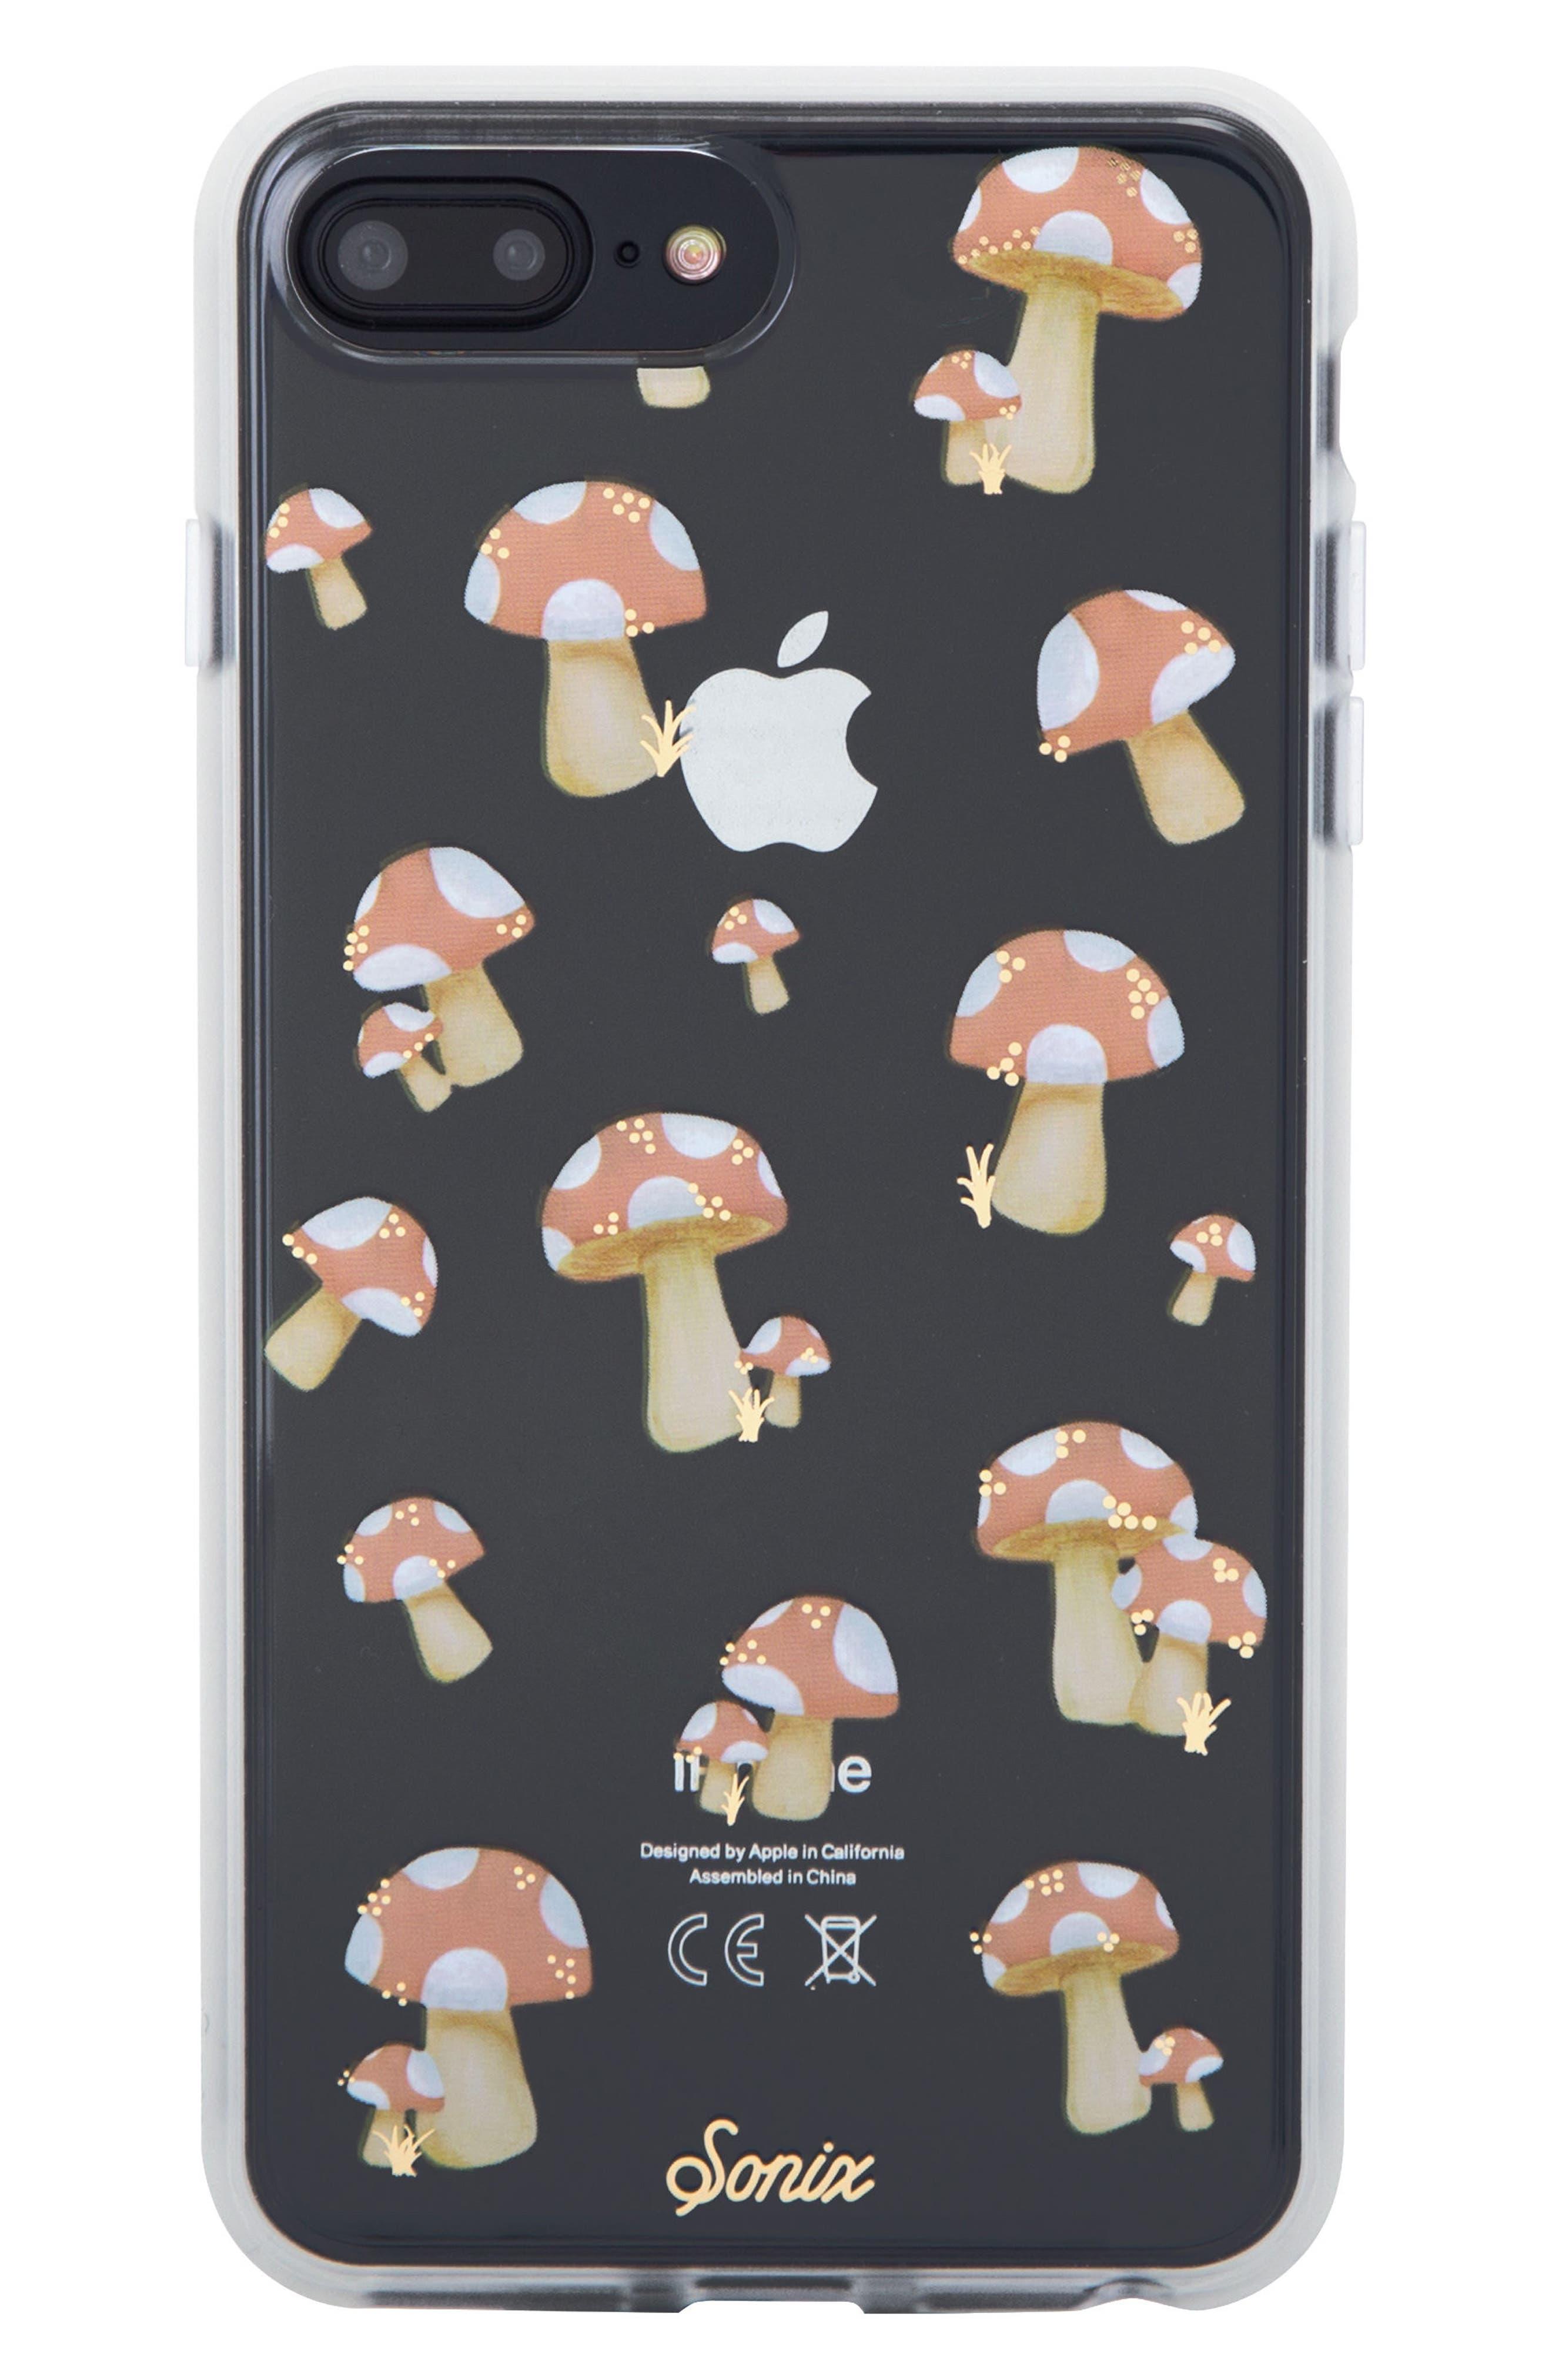 Mushroom iPhone 6/6s/7/8 & 6/6s/7/8 Plus Case,                             Main thumbnail 1, color,                             650